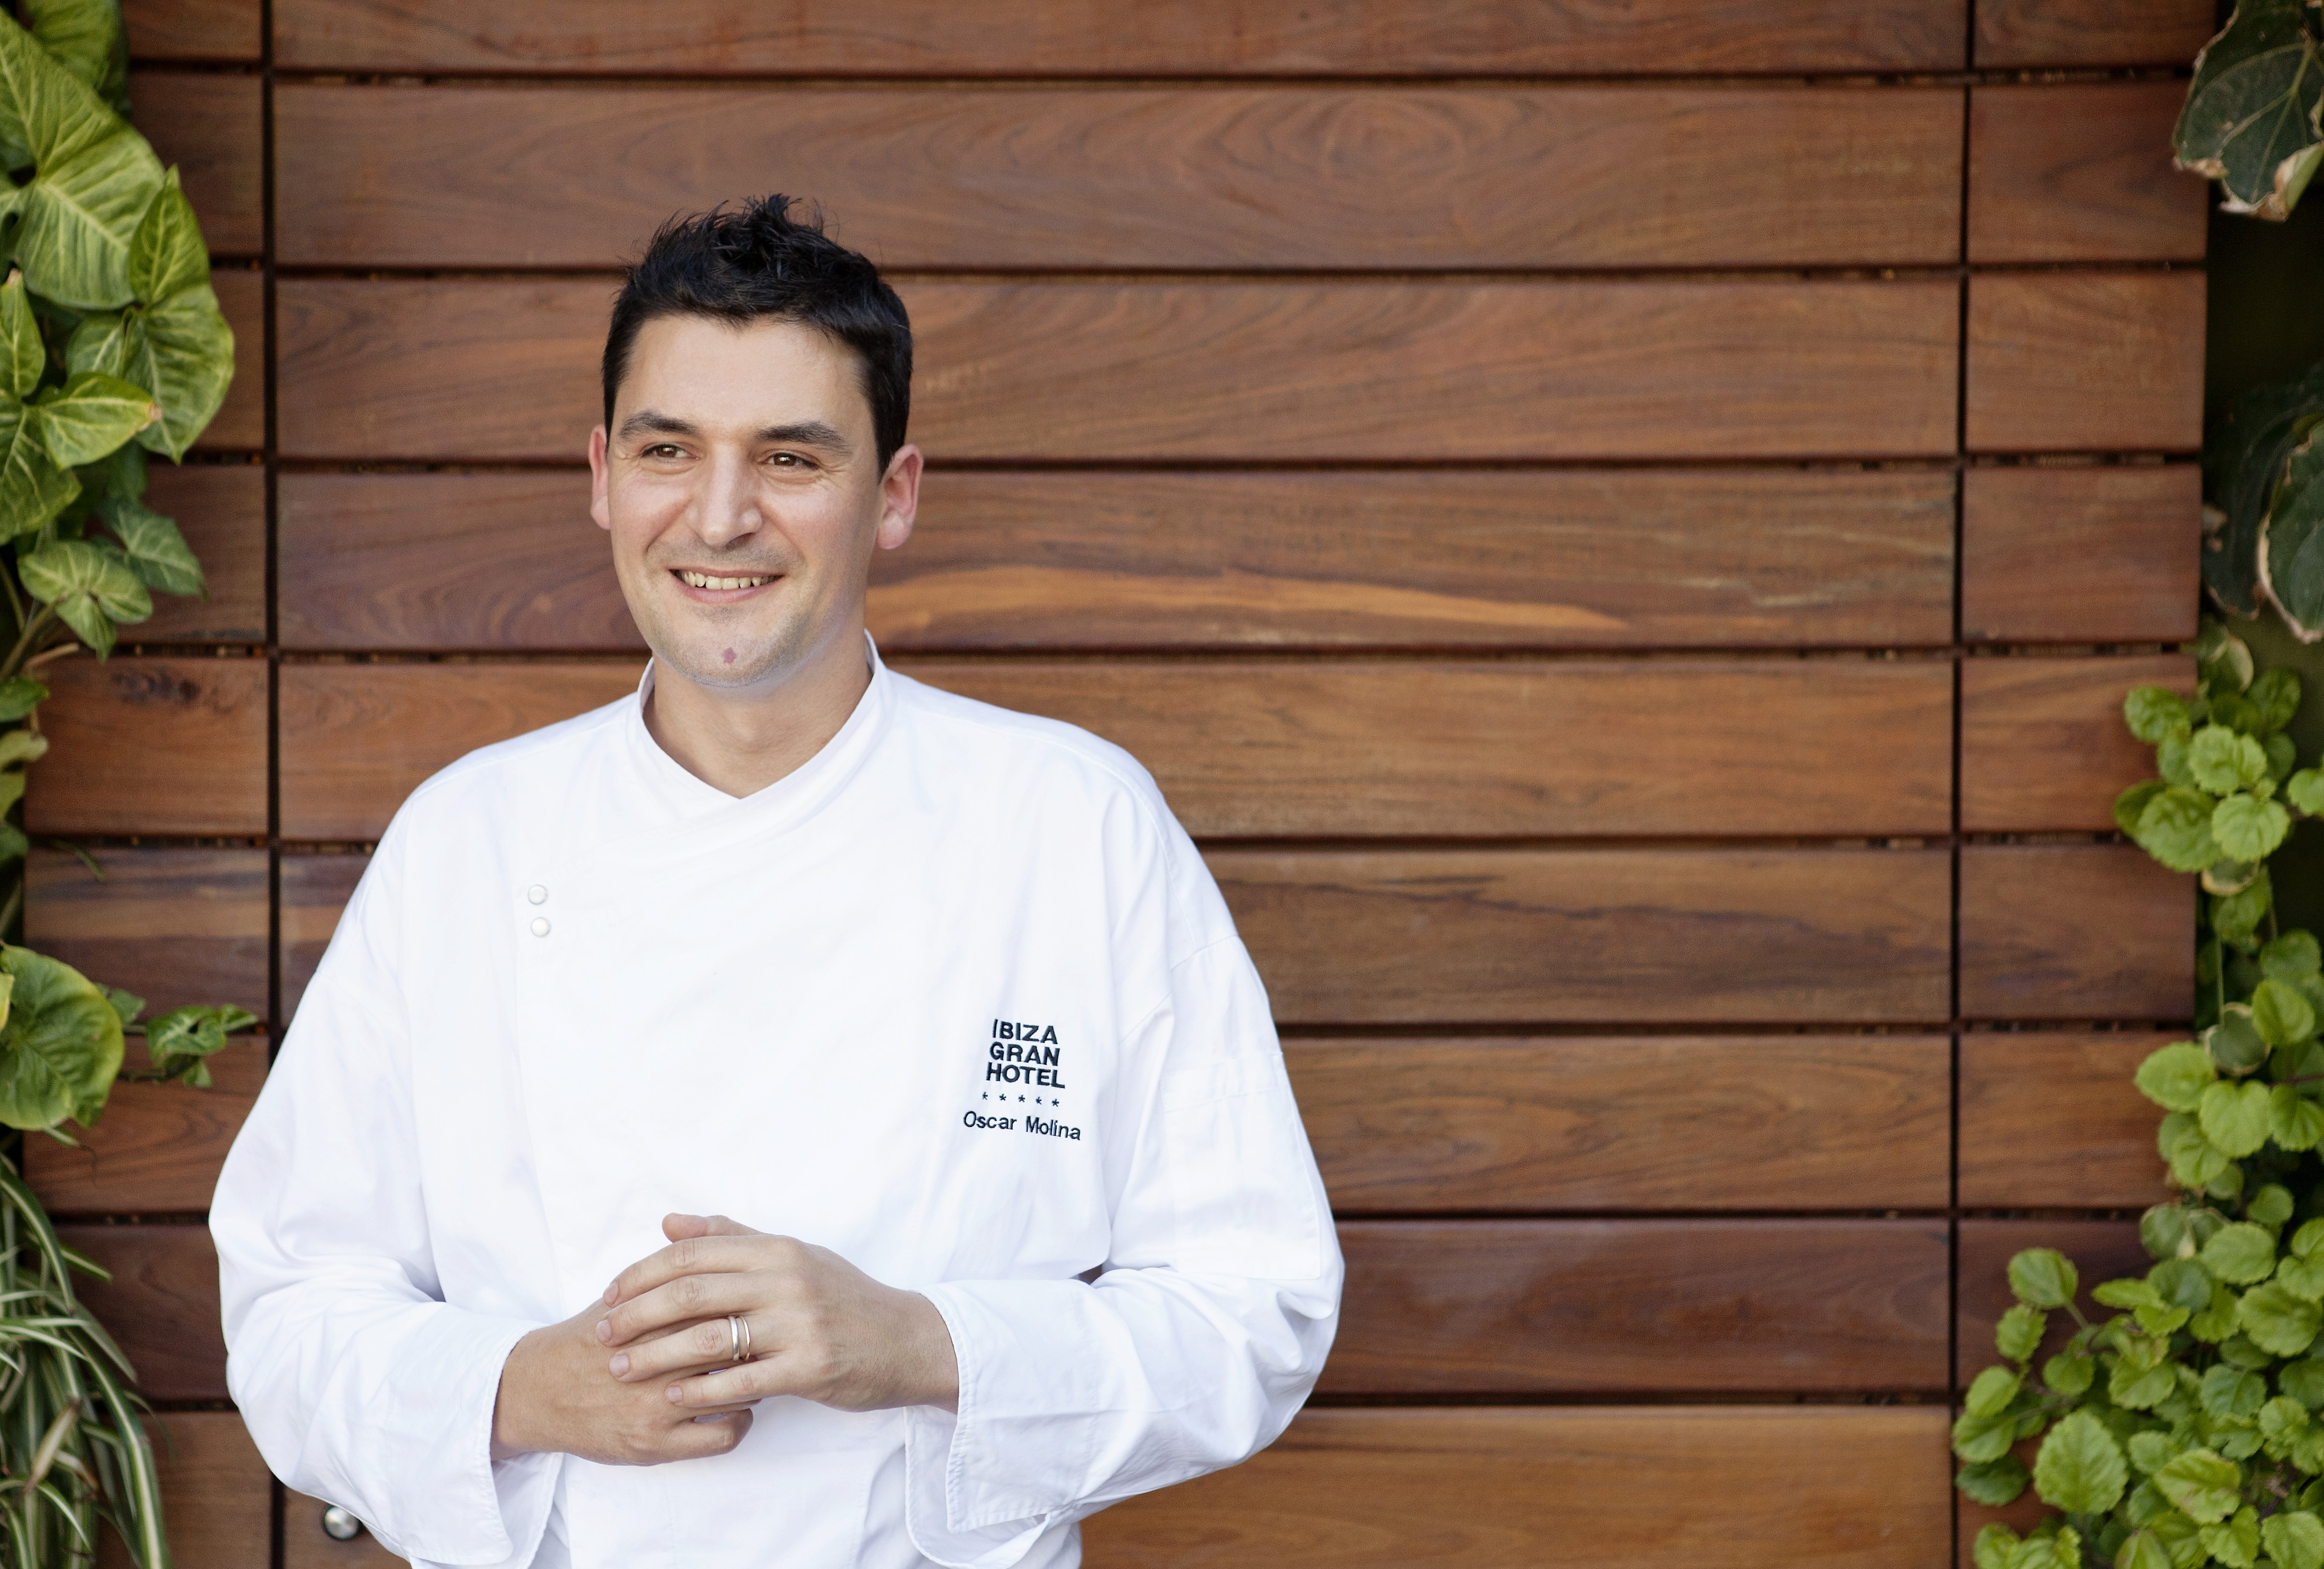 Chef Oscar Molina de La Gaia